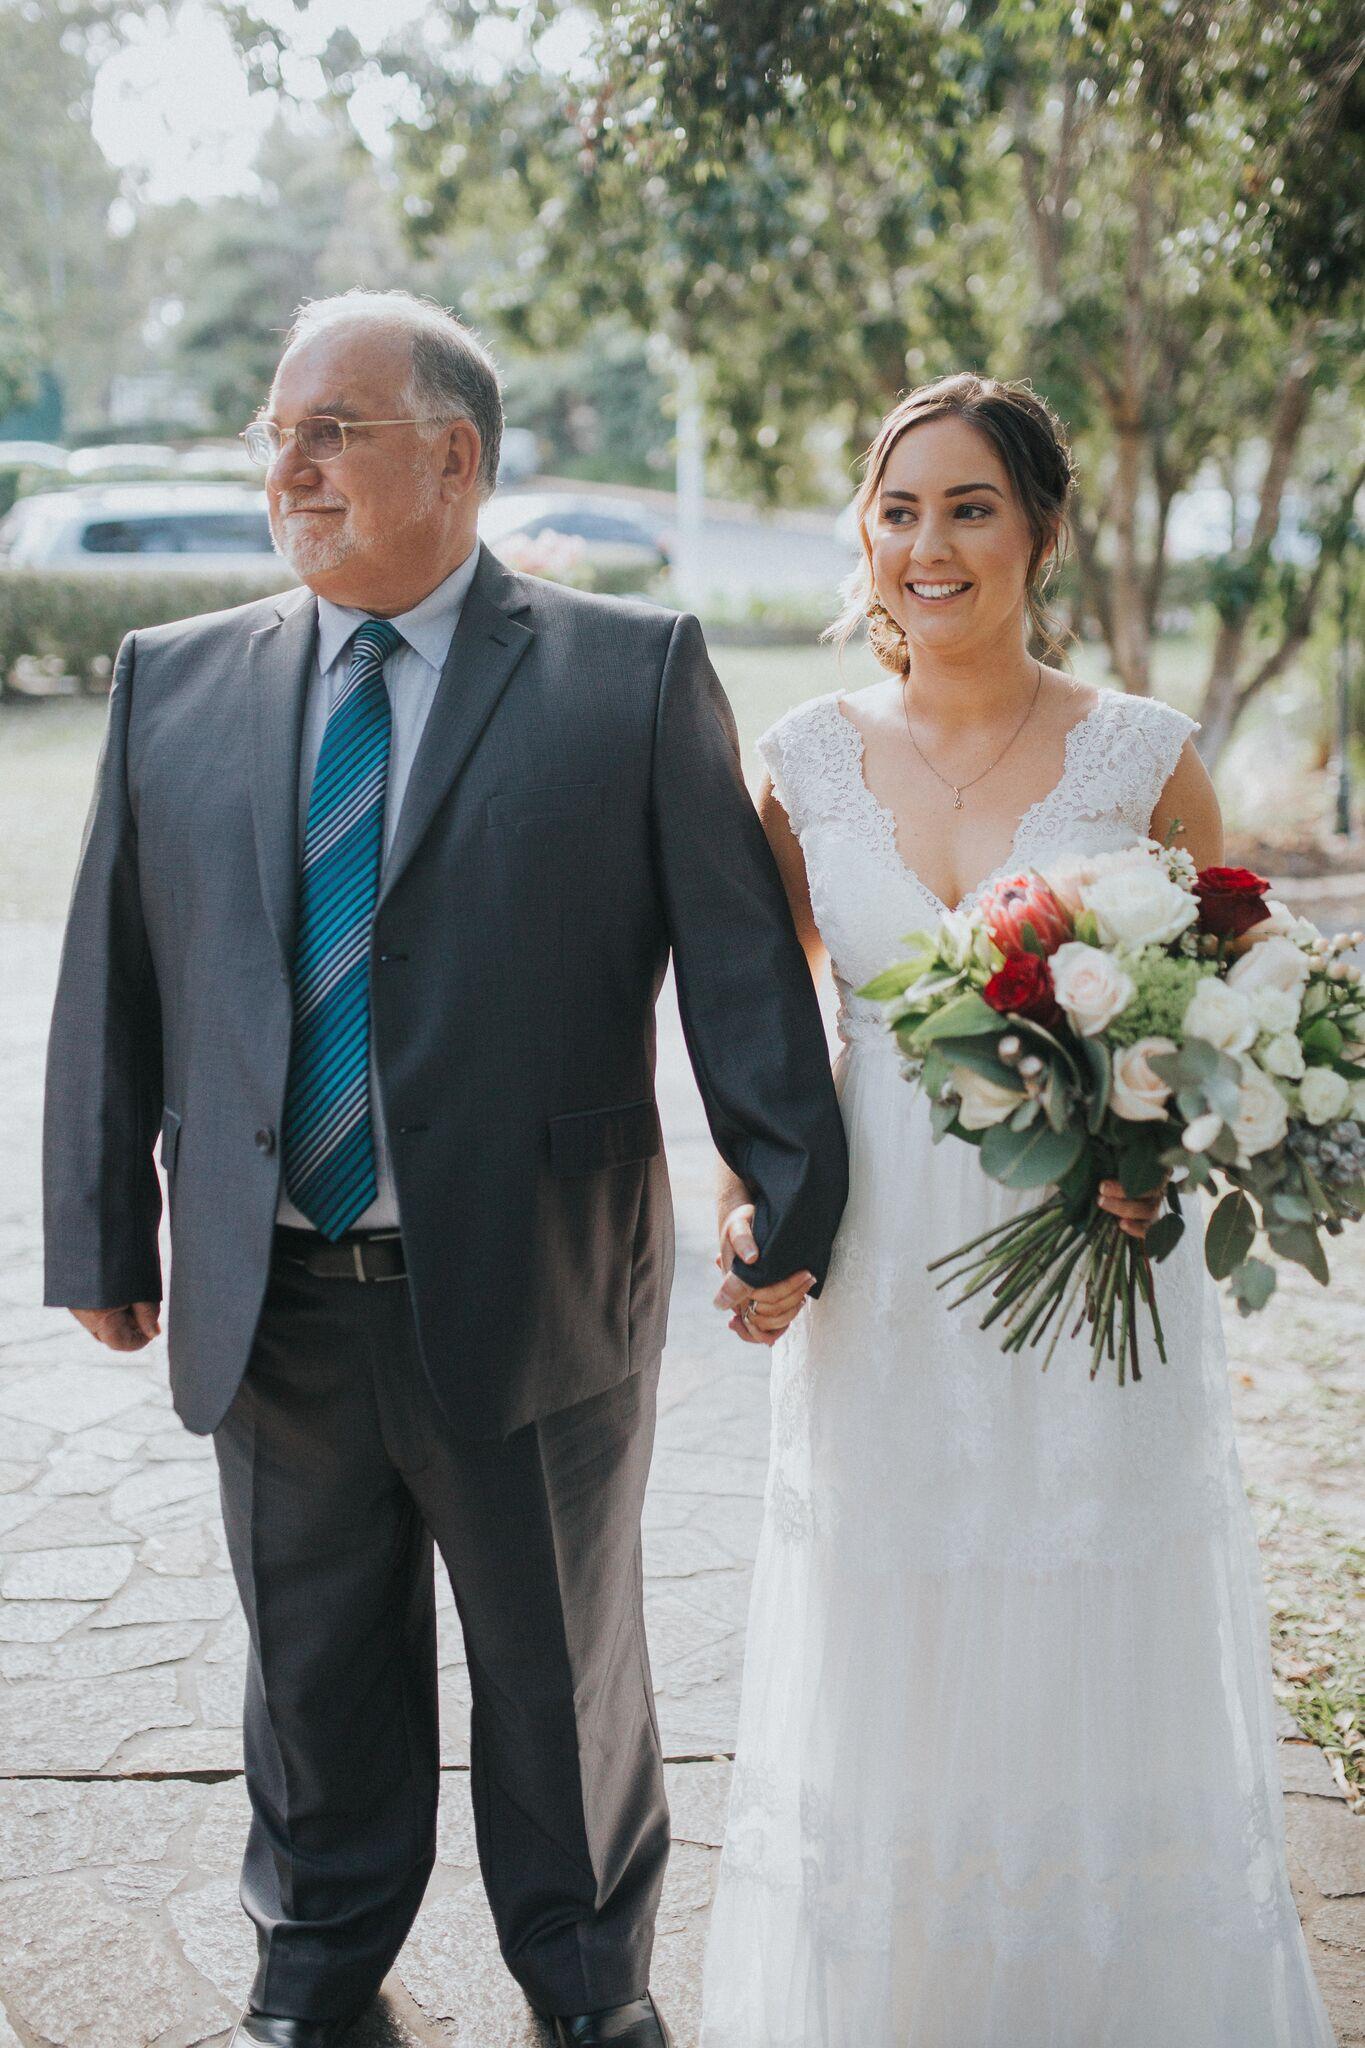 Trost_wedding_highres_228_preview.jpeg